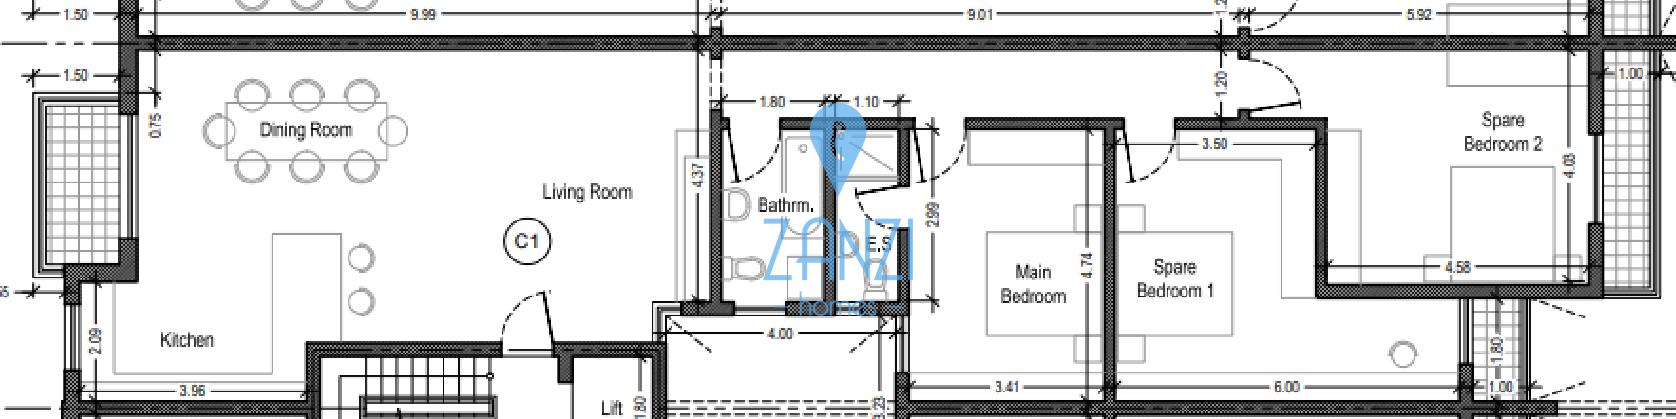 Qormi – 3 Bedroom Apartment For Sale